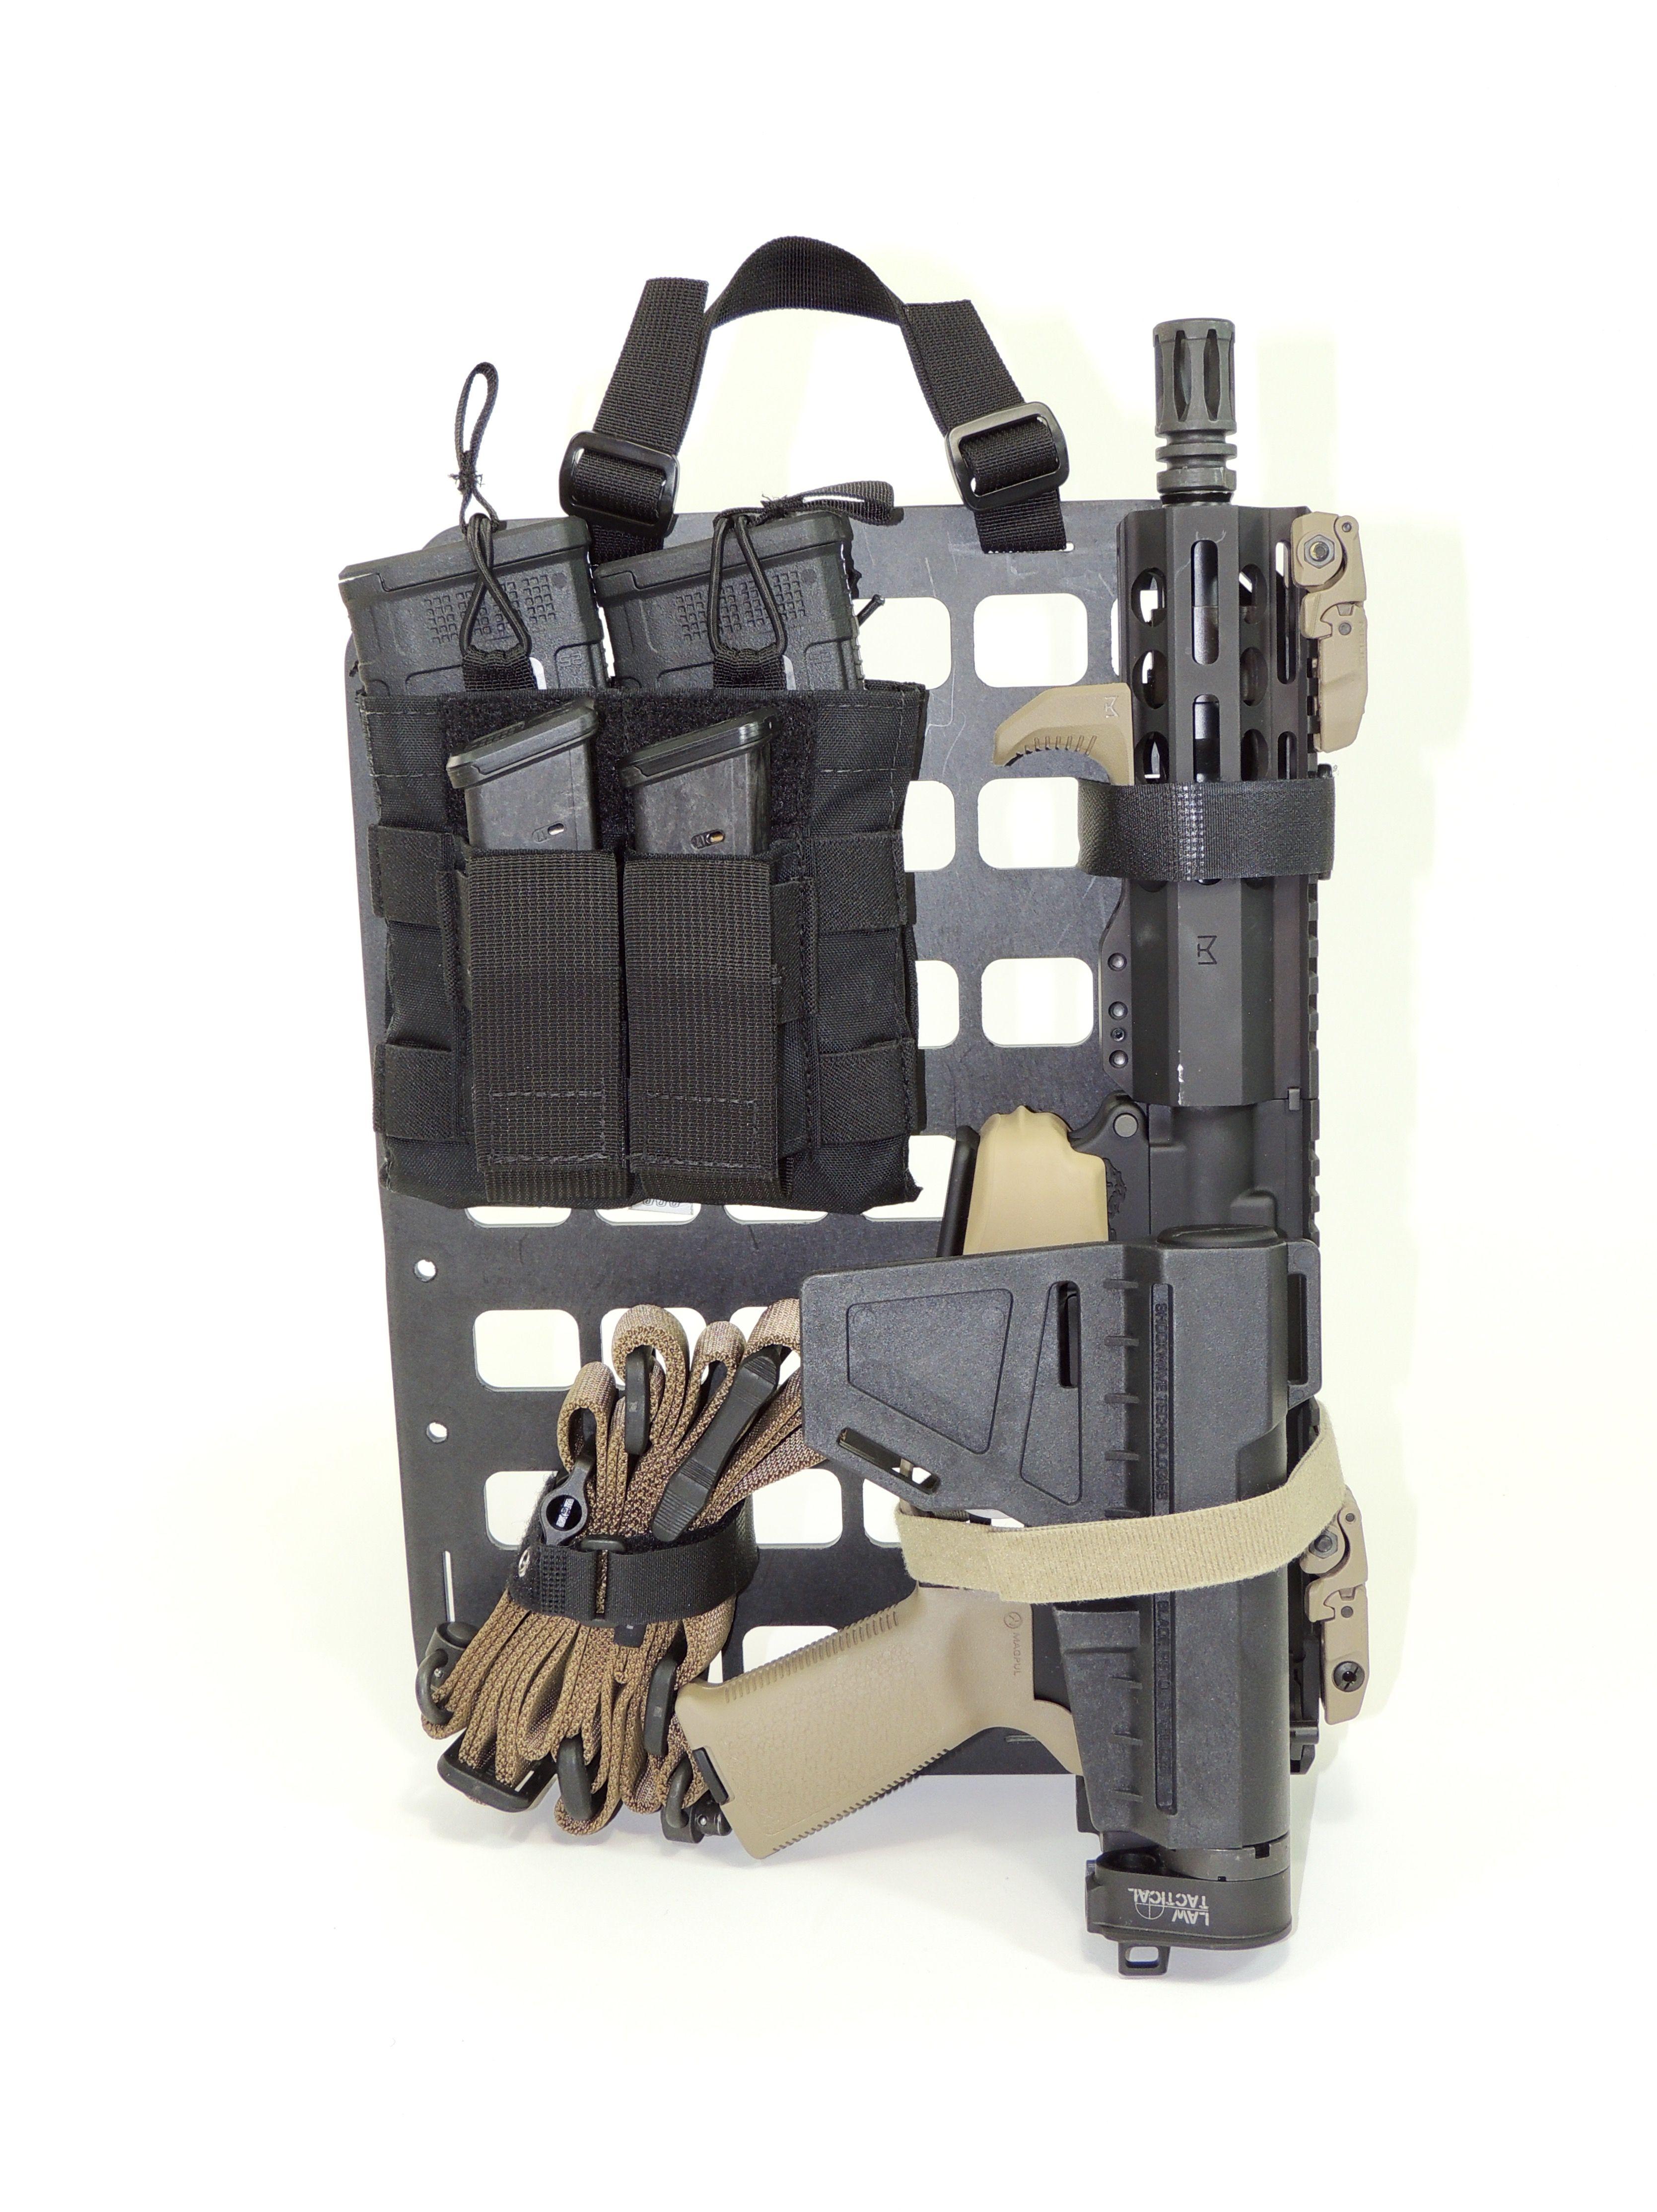 Grey Man Tactical Rip M Rigid Insert Panel Molle With Ar15 Pistol Build W Law Gen Iii Folder And Ghost Gear Magazine Holders